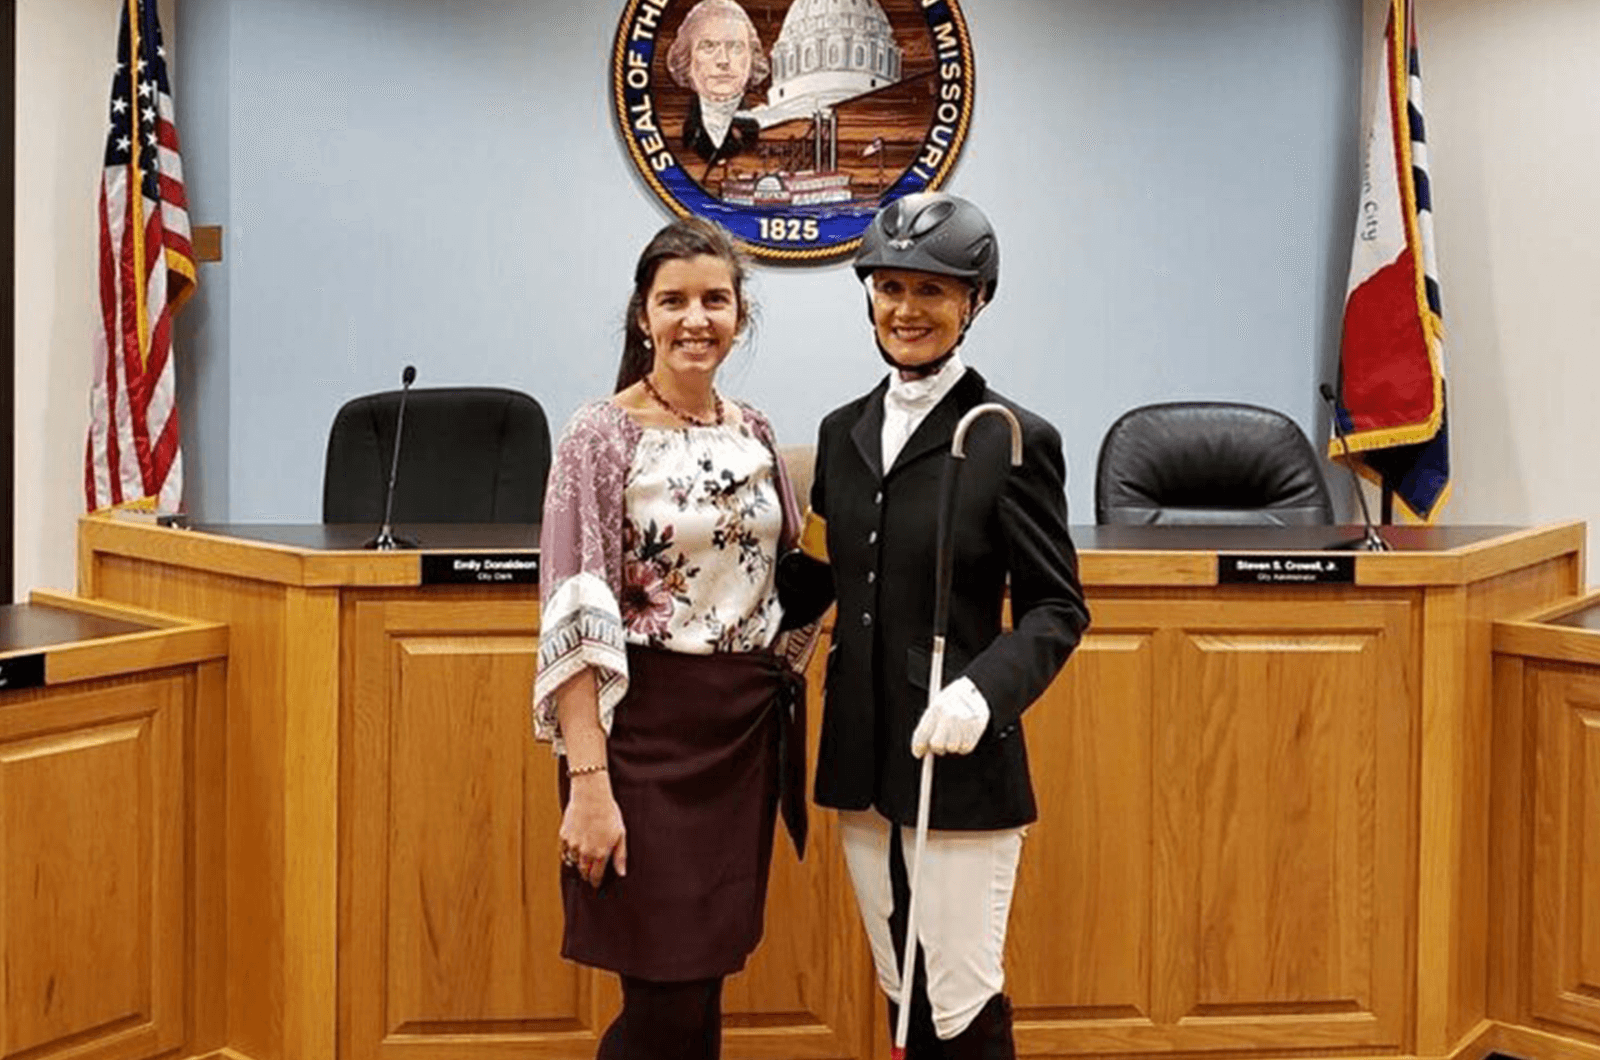 Deborah poses with Mayor Carrie Tergin of Jefferson City, Missouri. Mayor Tergin endorsed Deborah thanks to her work in the community through her company, Vision Beyond Eyesight.